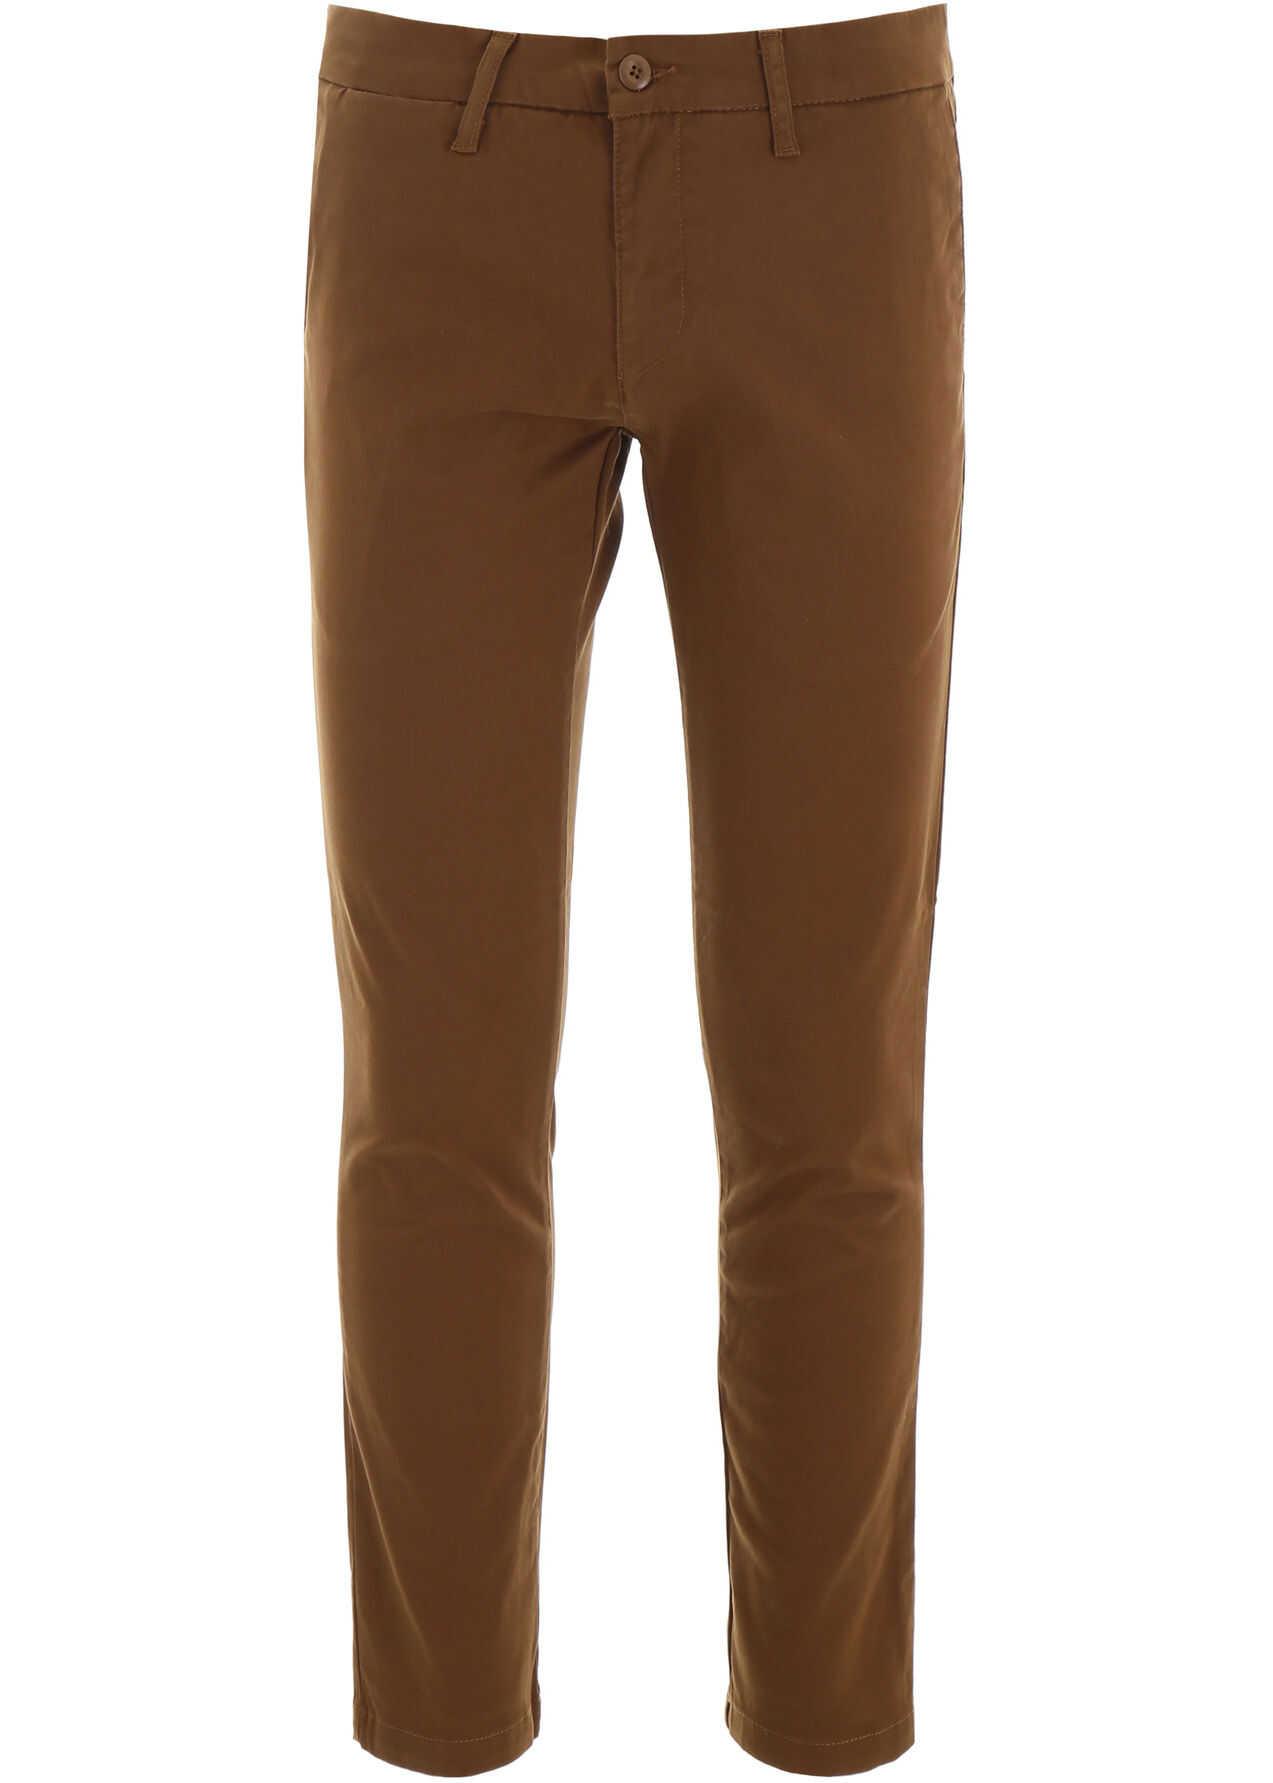 Carhartt Chino Trousers HAMILTON BROWN